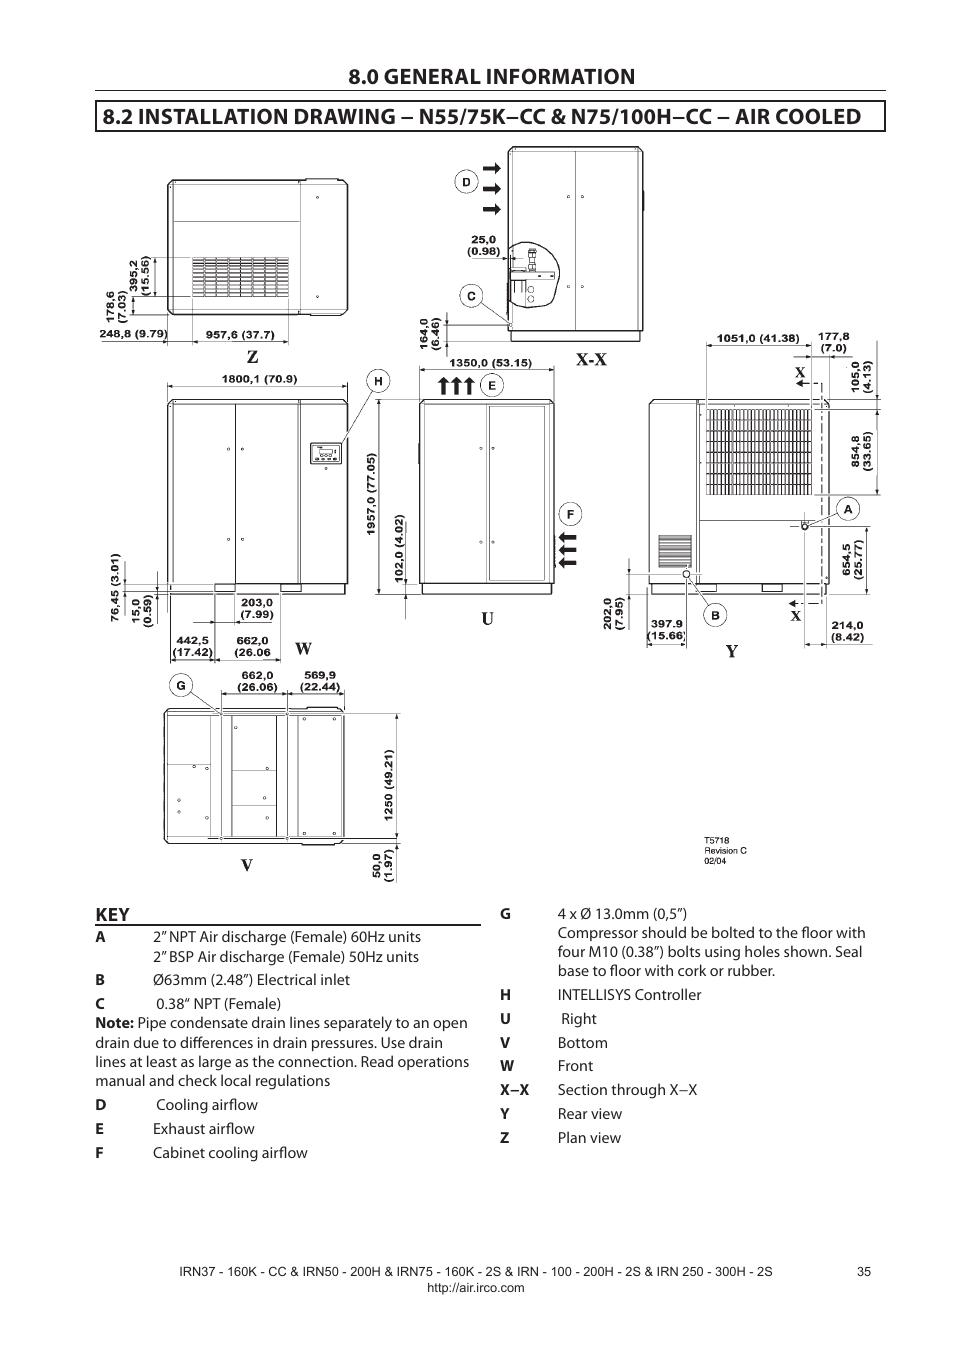 Ingersoll-Rand NIRVANA IRN75-160K-2S User Manual | Page 37 / 100 | Also  for: NIRVANA IRN50-200H-CC, NIRVANA IRN100-200H-2S, NIRVANA IRN37-160K-CC,  ...